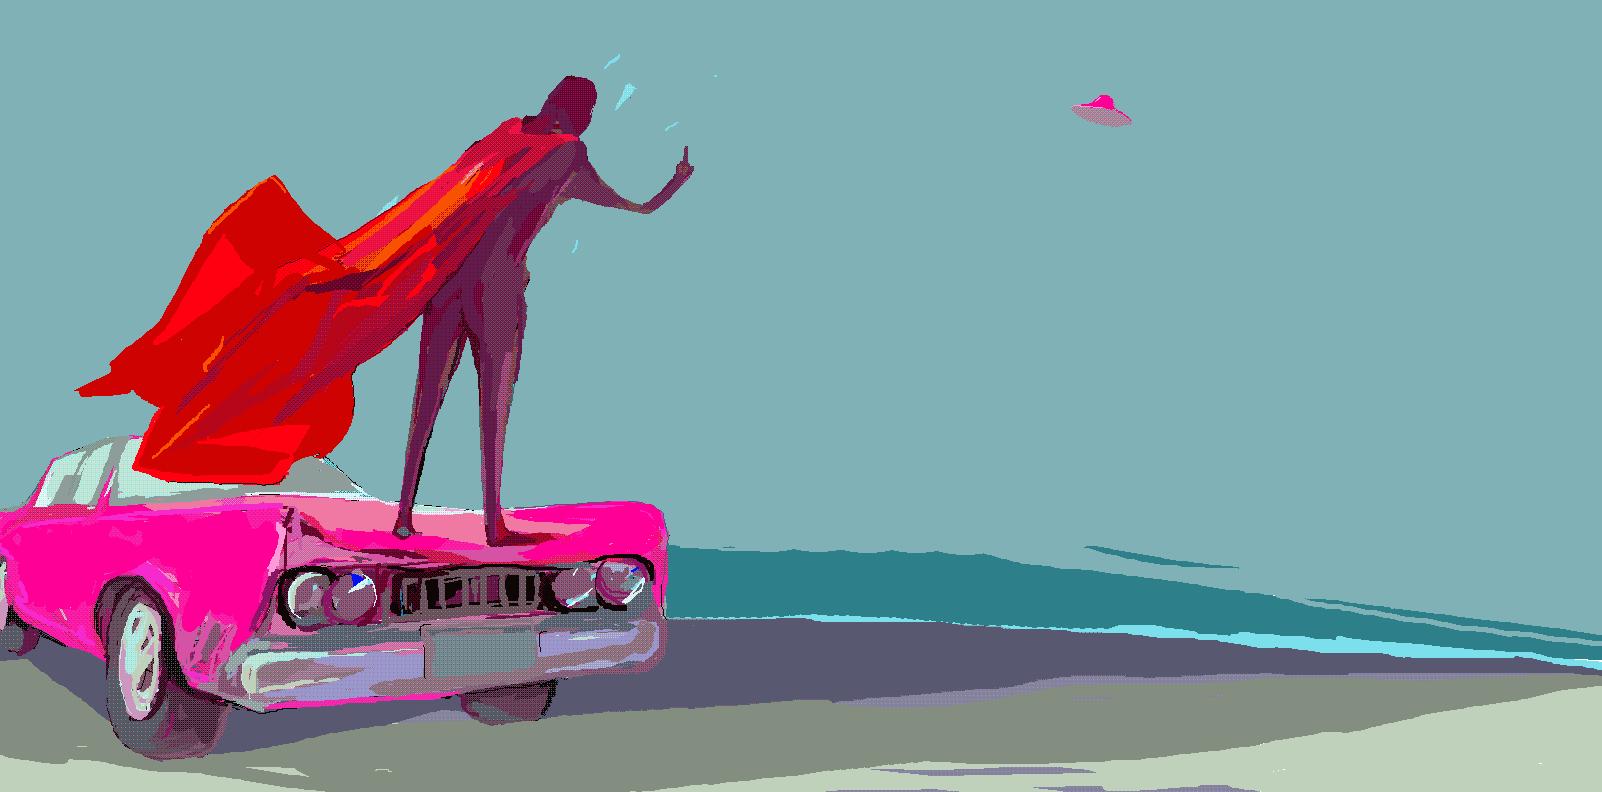 super hero says goodbye to UFO